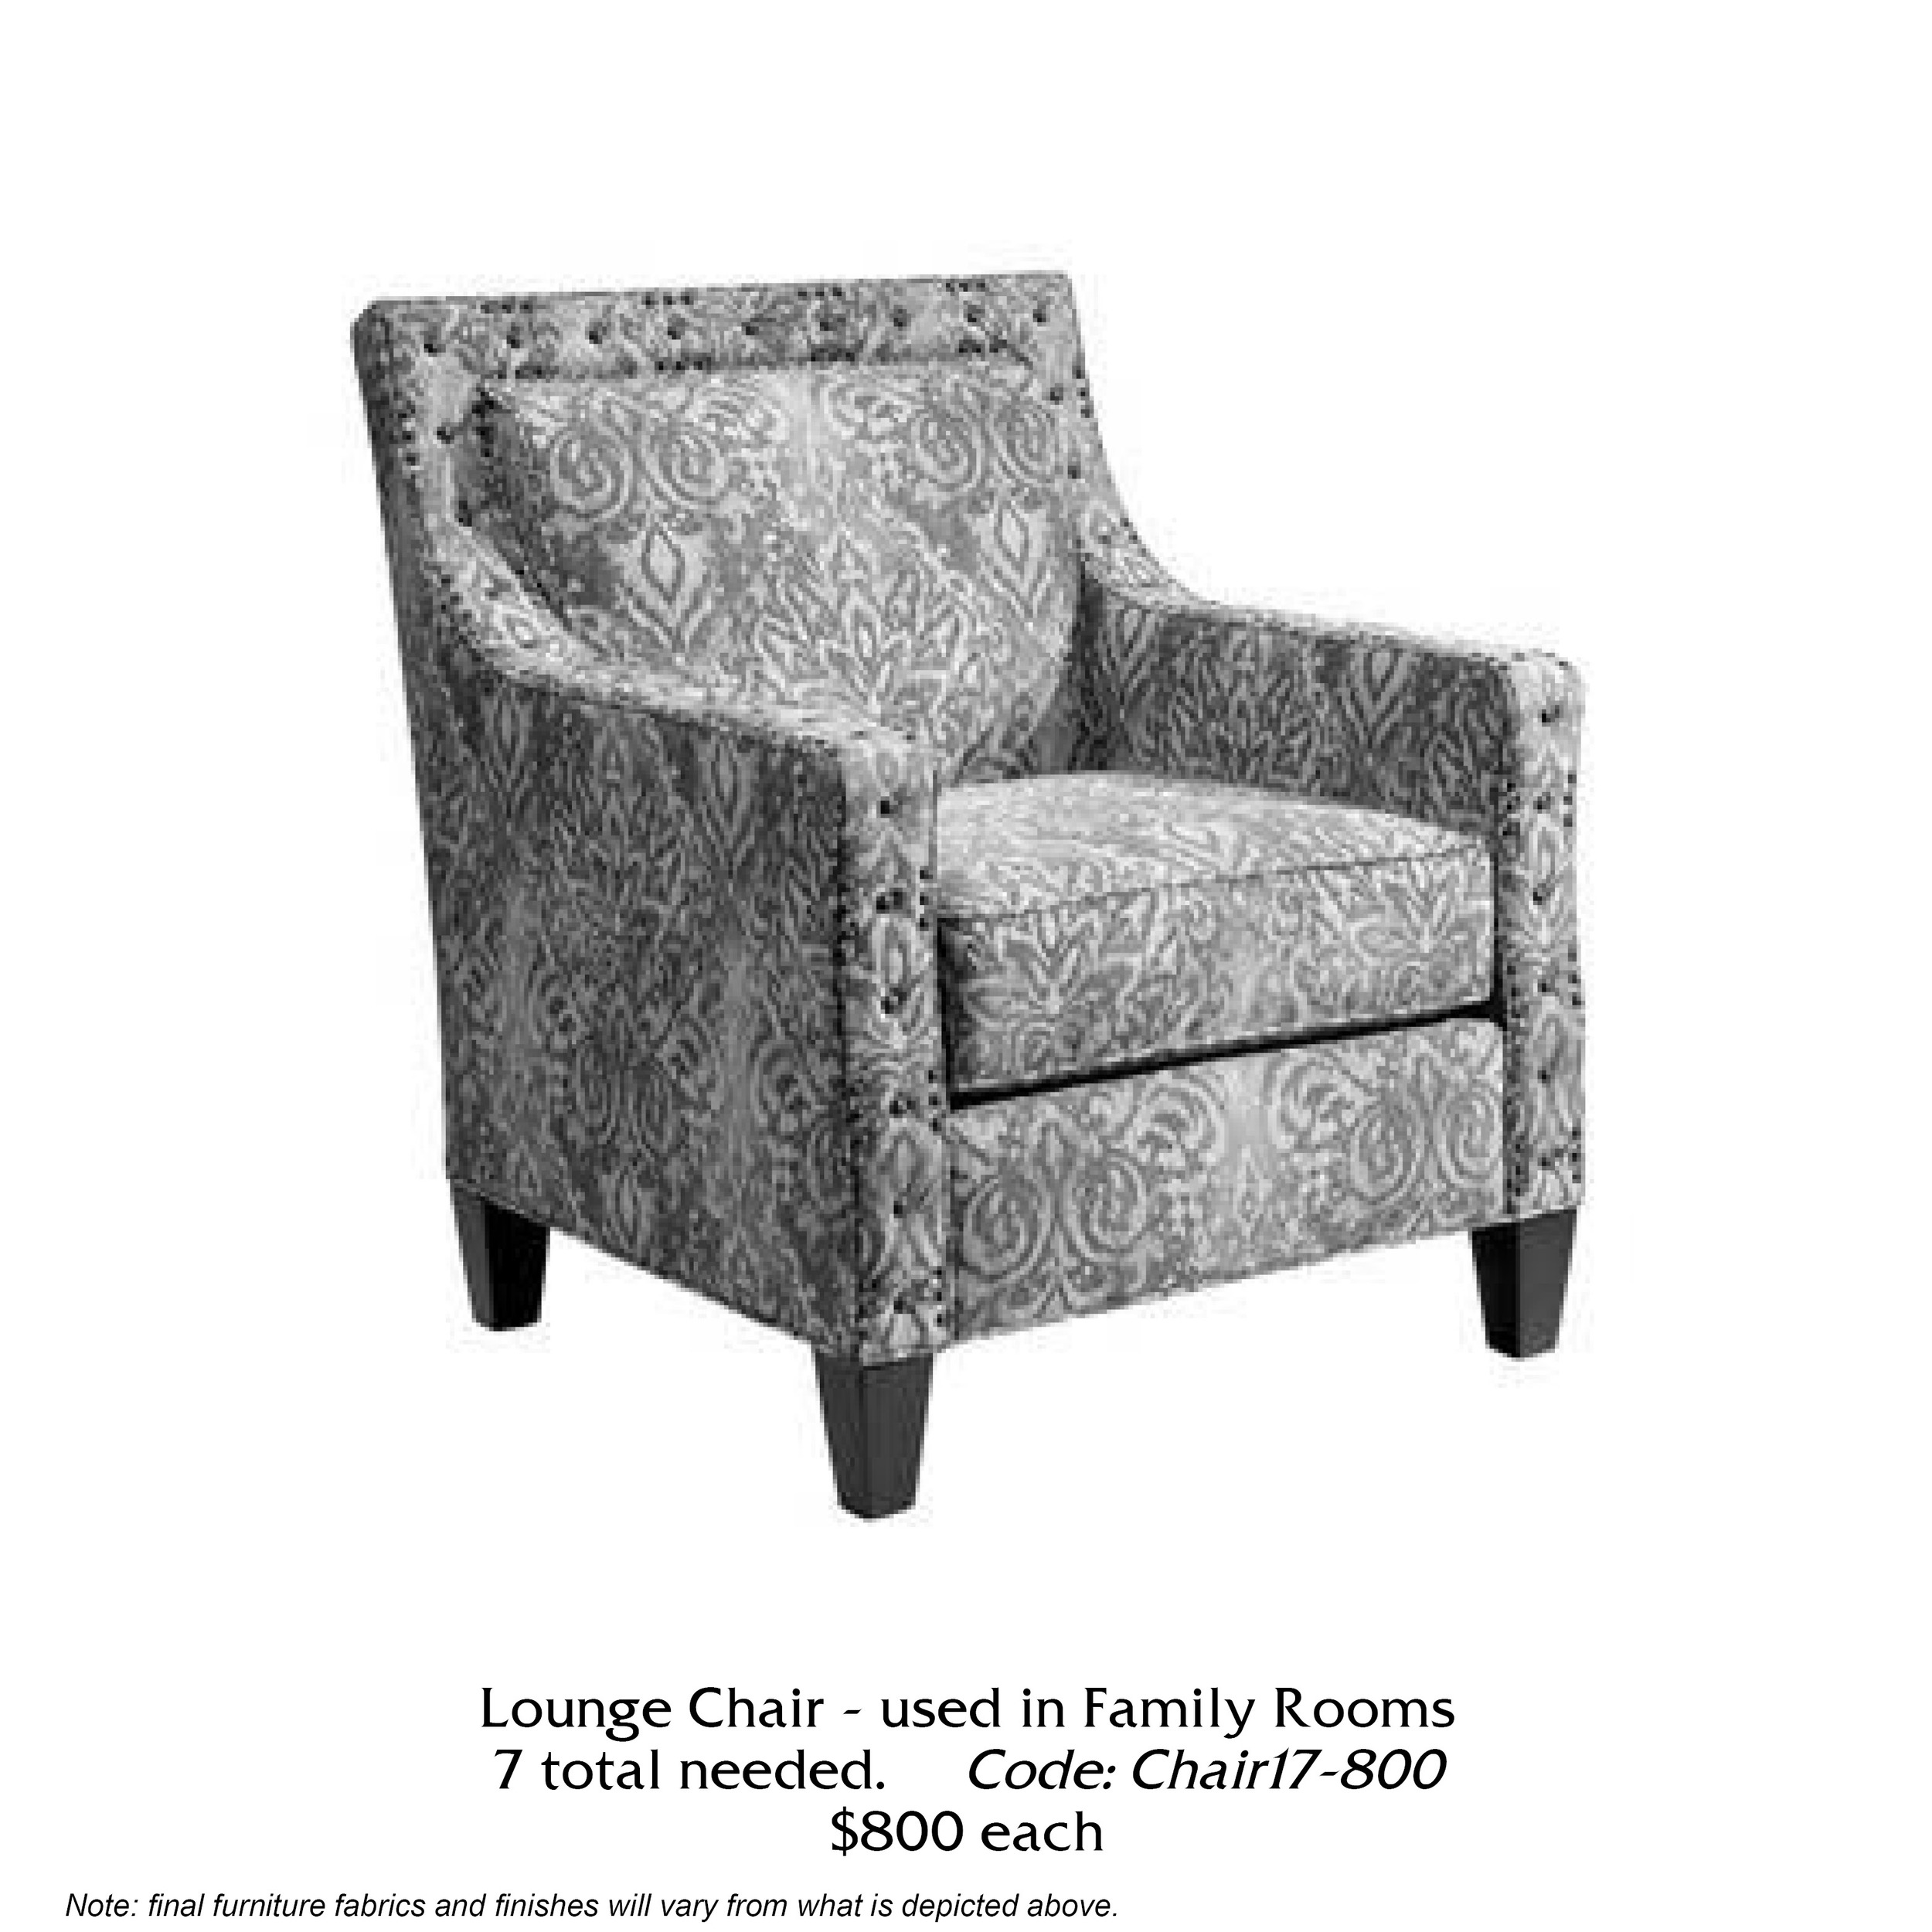 A123-F17-B123-F72-Lounge Chair - 3-4.jpg